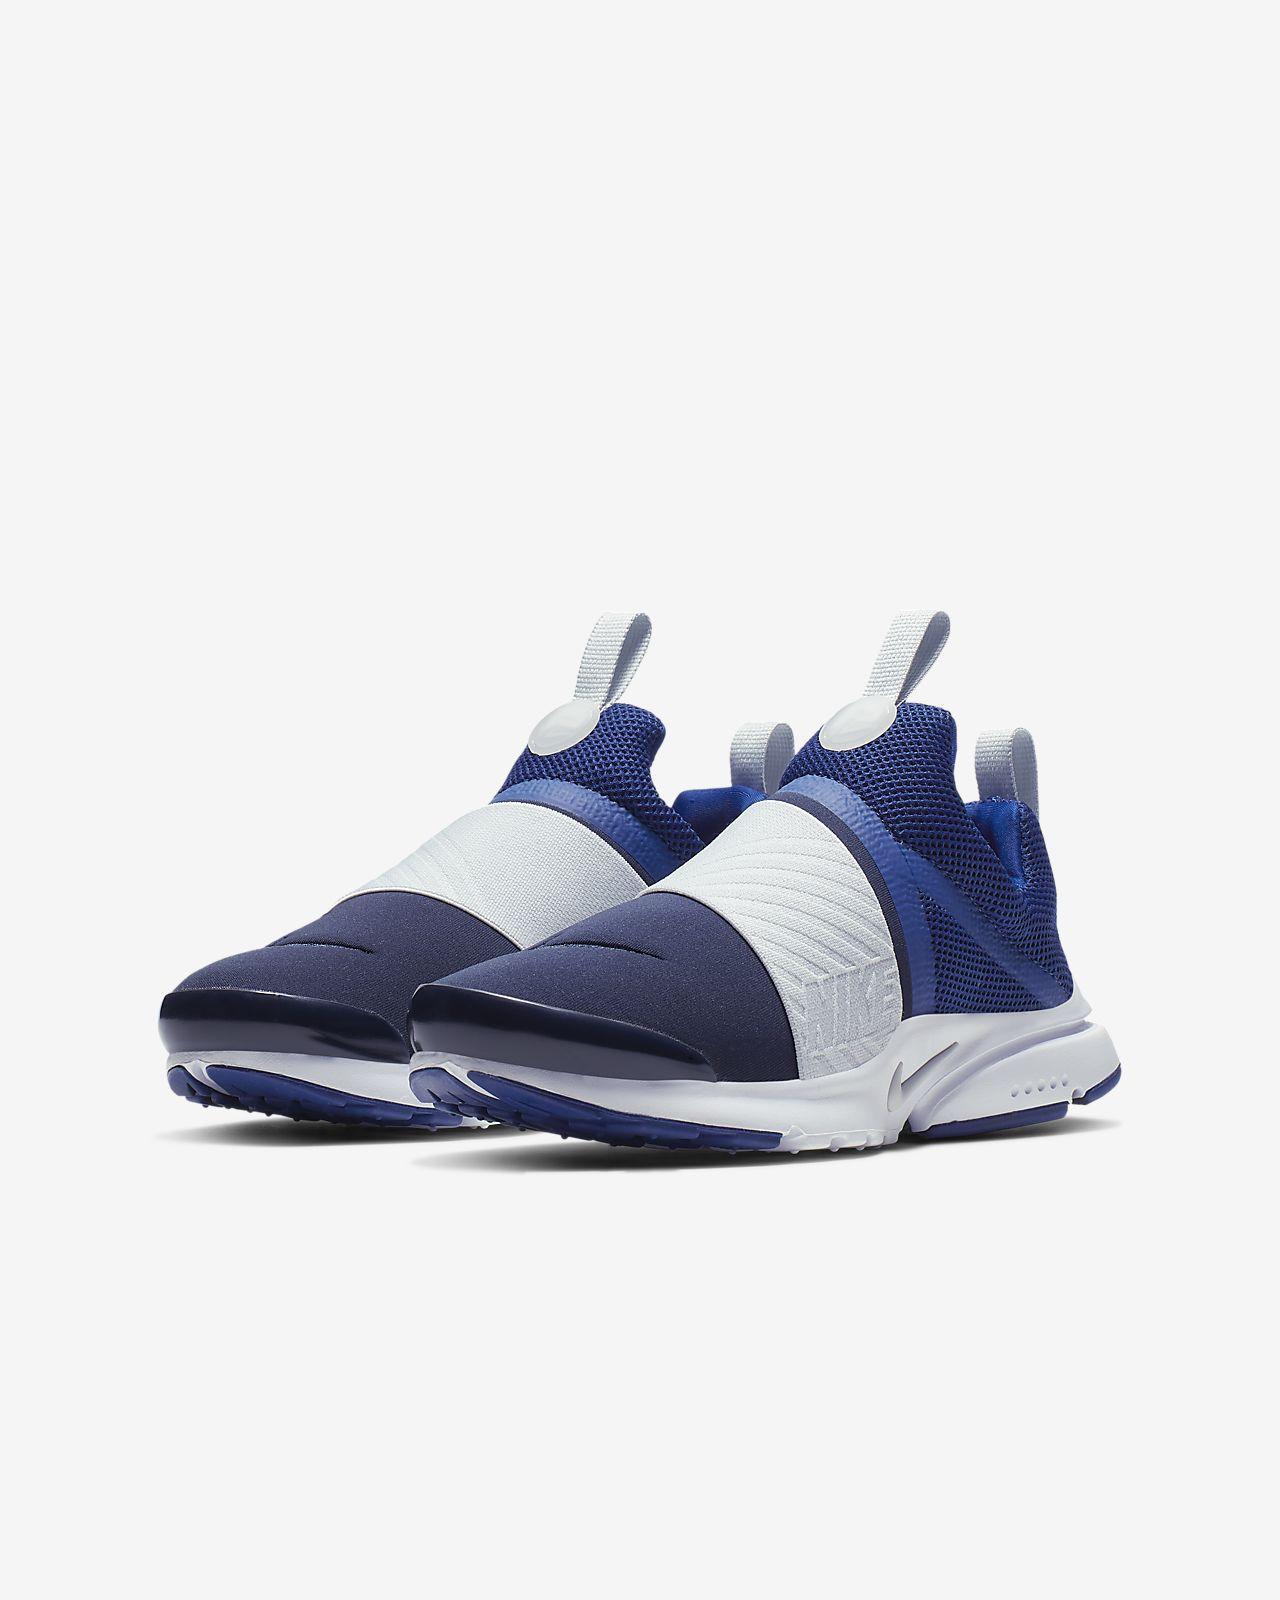 a8ecb025c7 Nike Presto Extreme Big Kids' Shoe. Nike.com